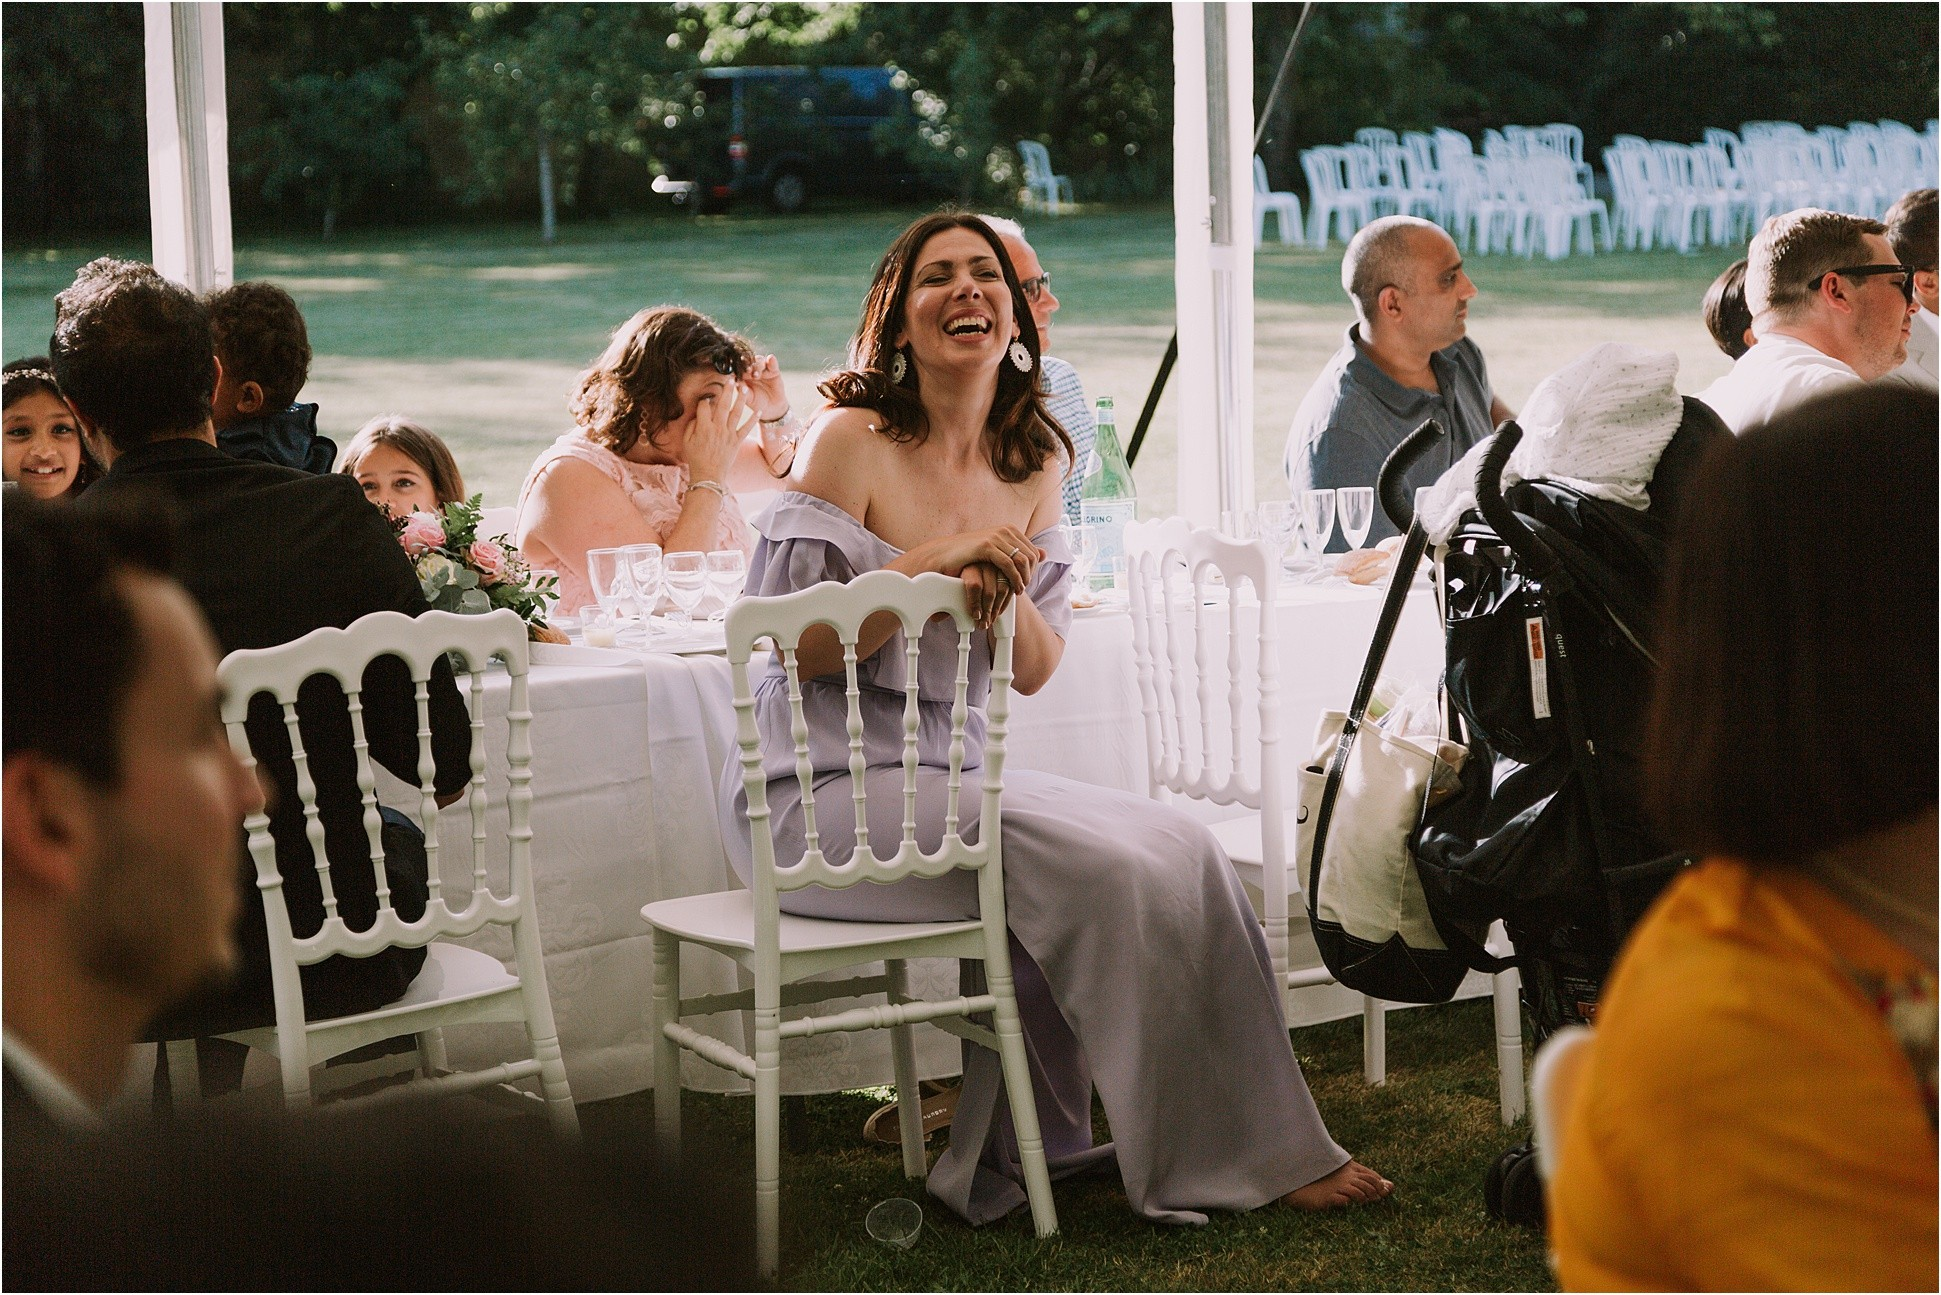 Kateryna-photos-photographe-mariage-chateau-st-paterne-mayenne-normandie_0160.jpg